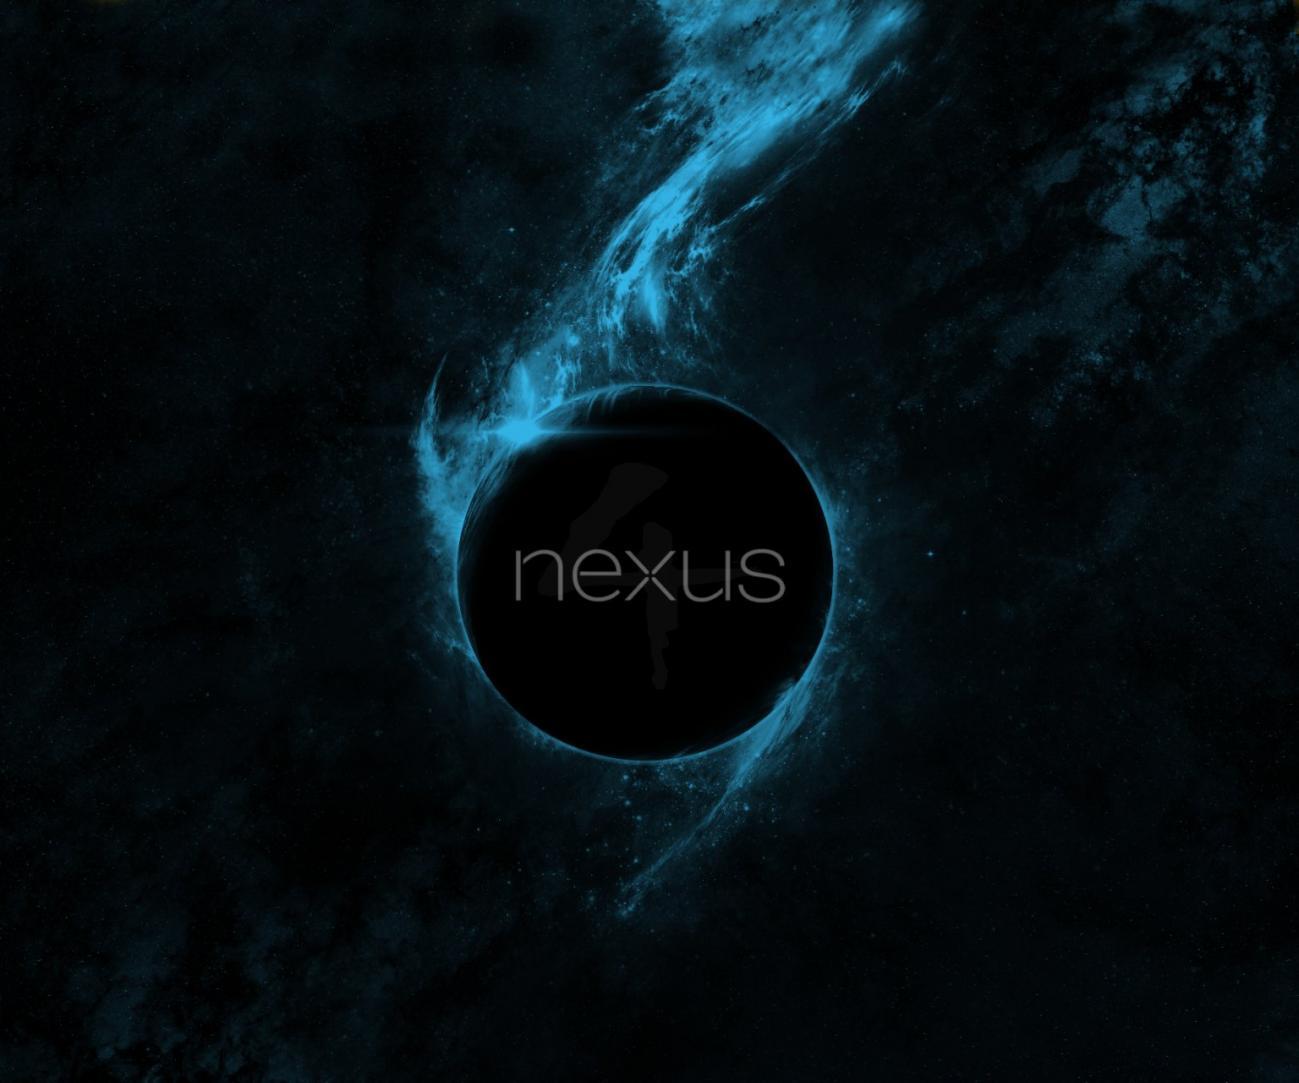 42 Desktop Nexus Hd Wallpapers On Wallpapersafari